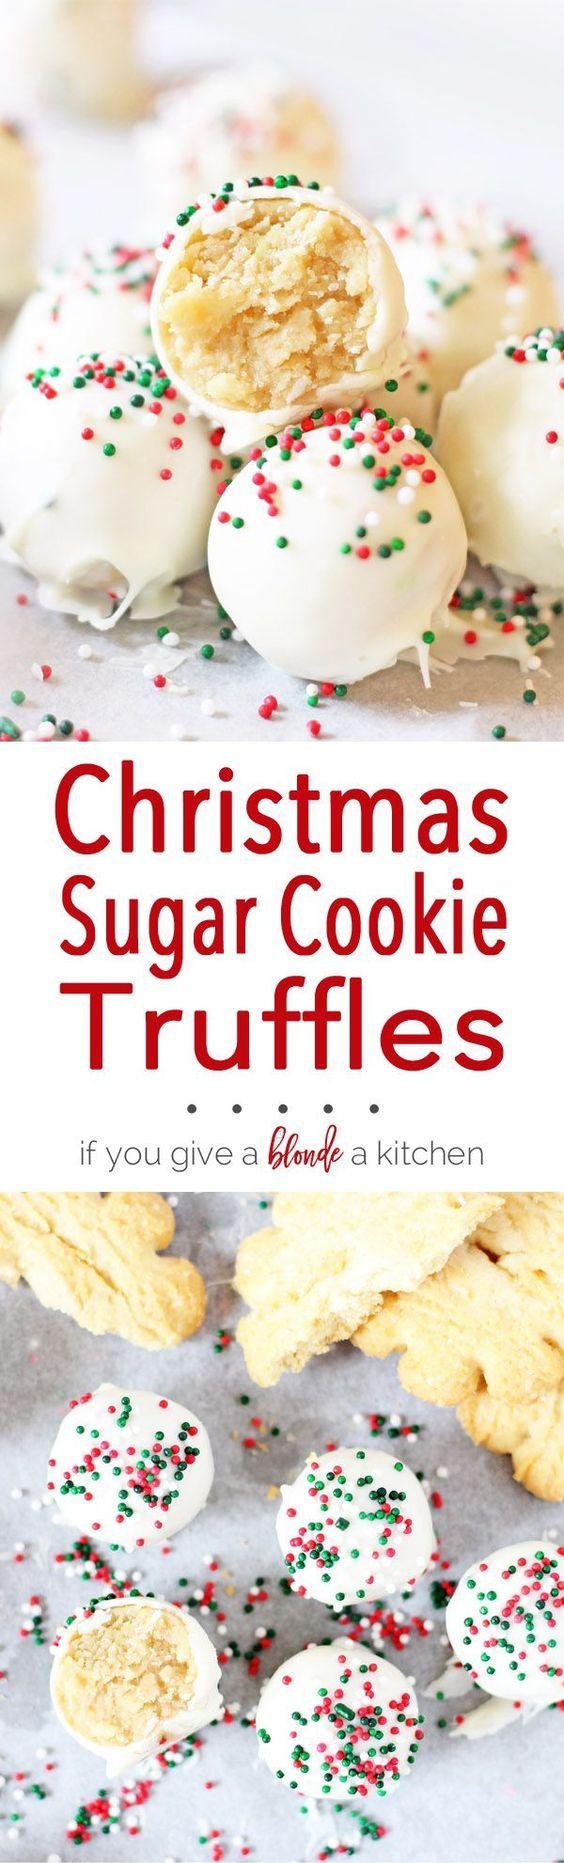 Holiday Cookies | Christmas Wreath No Bake Cookies #HolidayRecipes #HolidayFood #HolidayCookieRecipes #ChristmasCookieIdeas #ChristmasCookieExchange